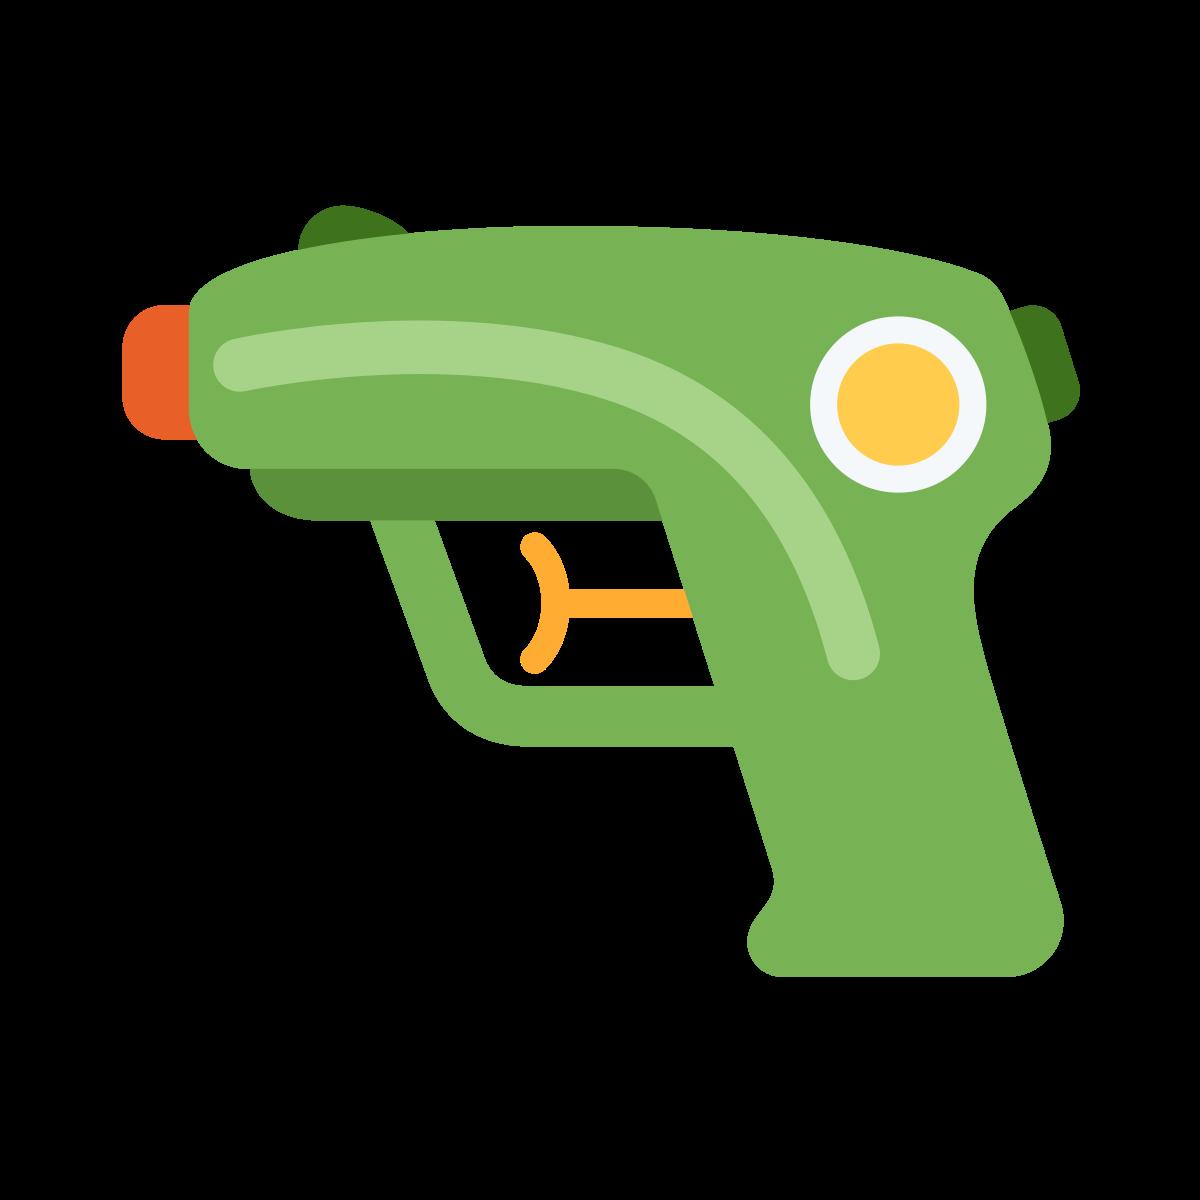 Water Pistol Emoji - What Emoji 類